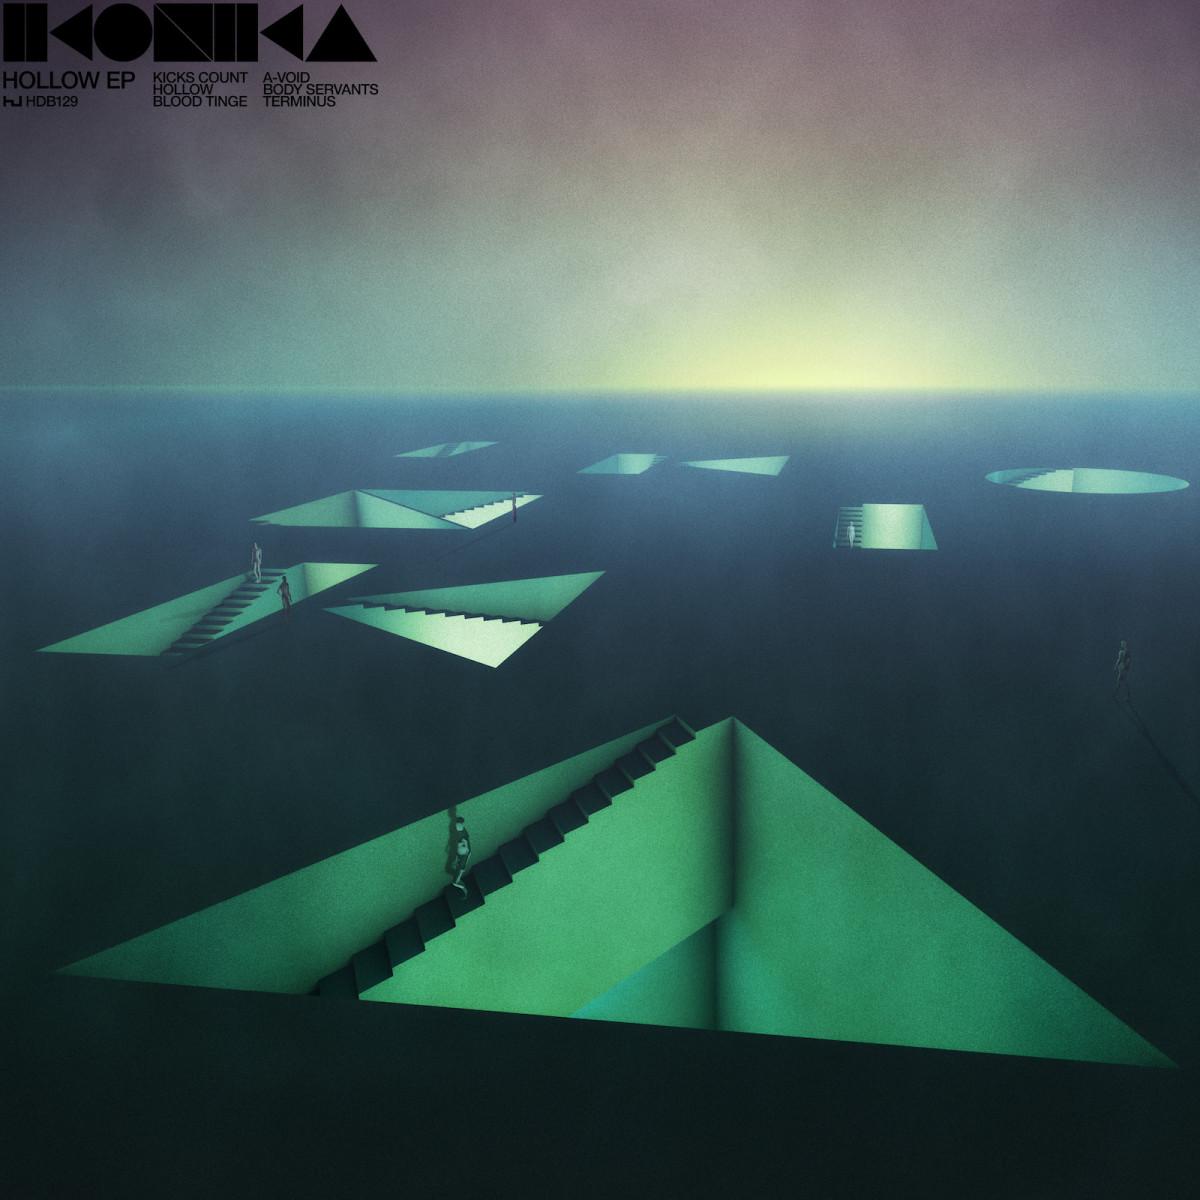 Ikonika Hollow EP